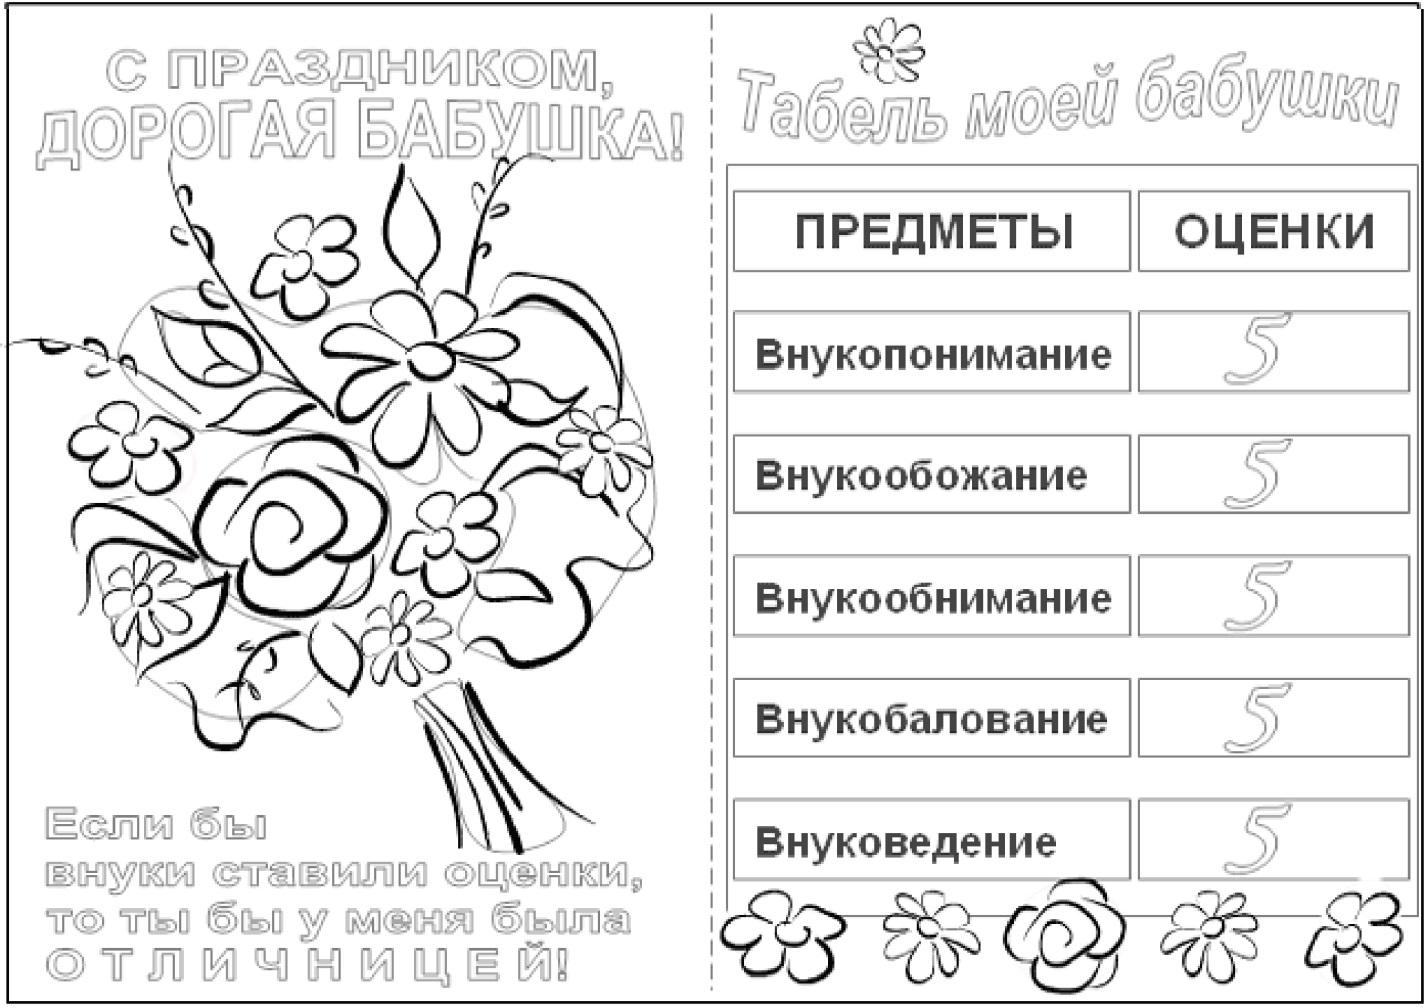 http://www.podolsk-baby.ru/assets/images/prazdniki/tabel_1.jpg